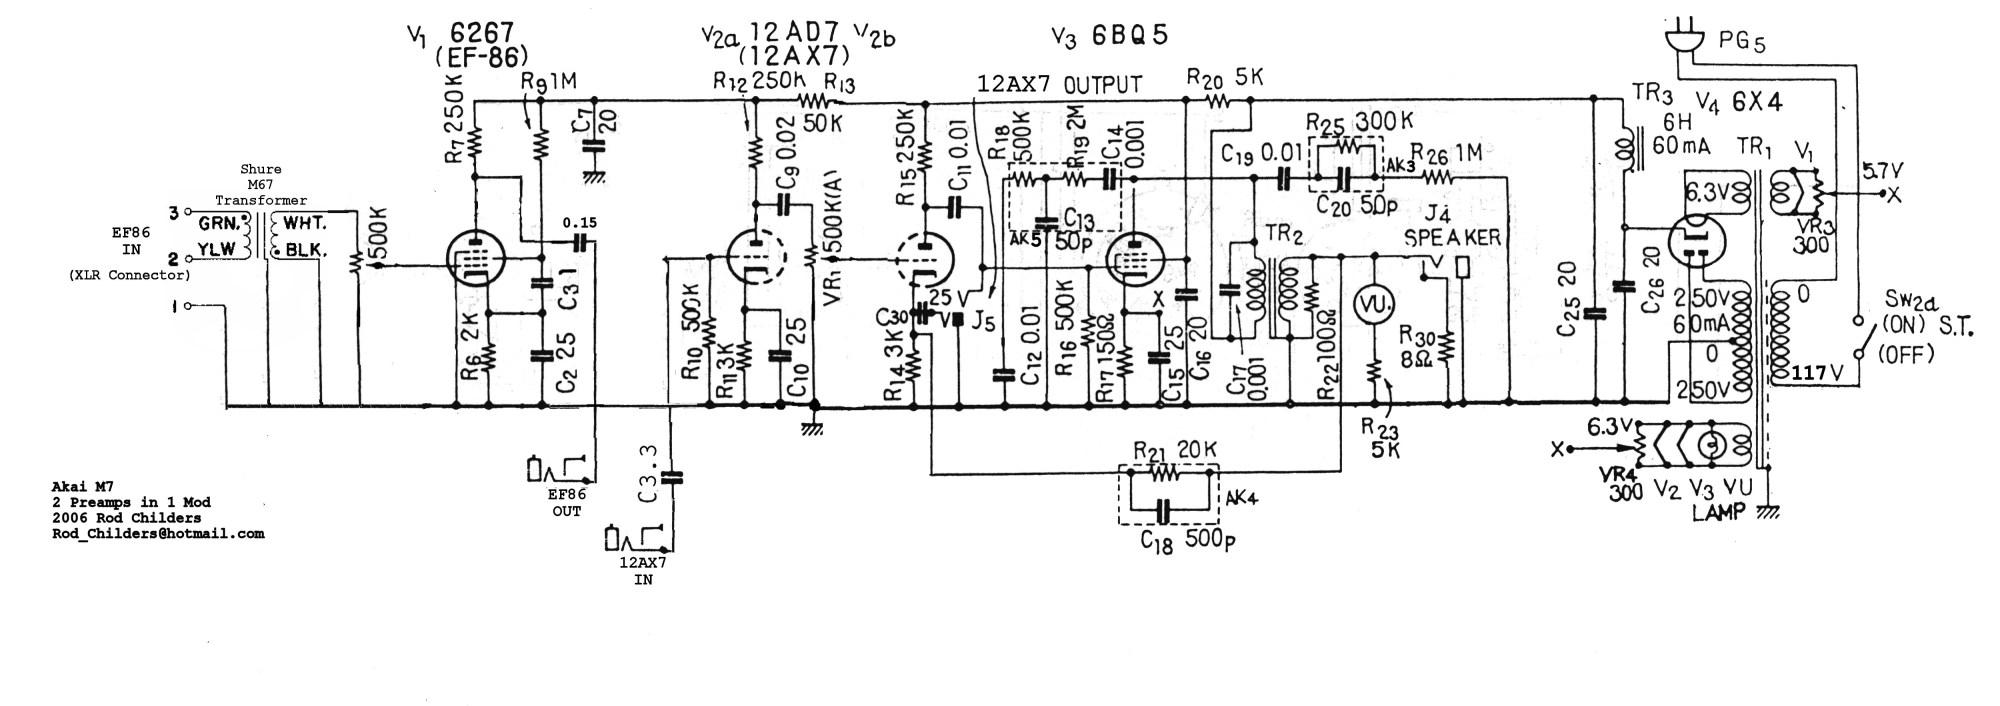 hight resolution of tube mic wiring diagram wiring diagram portal astatic microphones wiring diagram tube mic wiring diagram